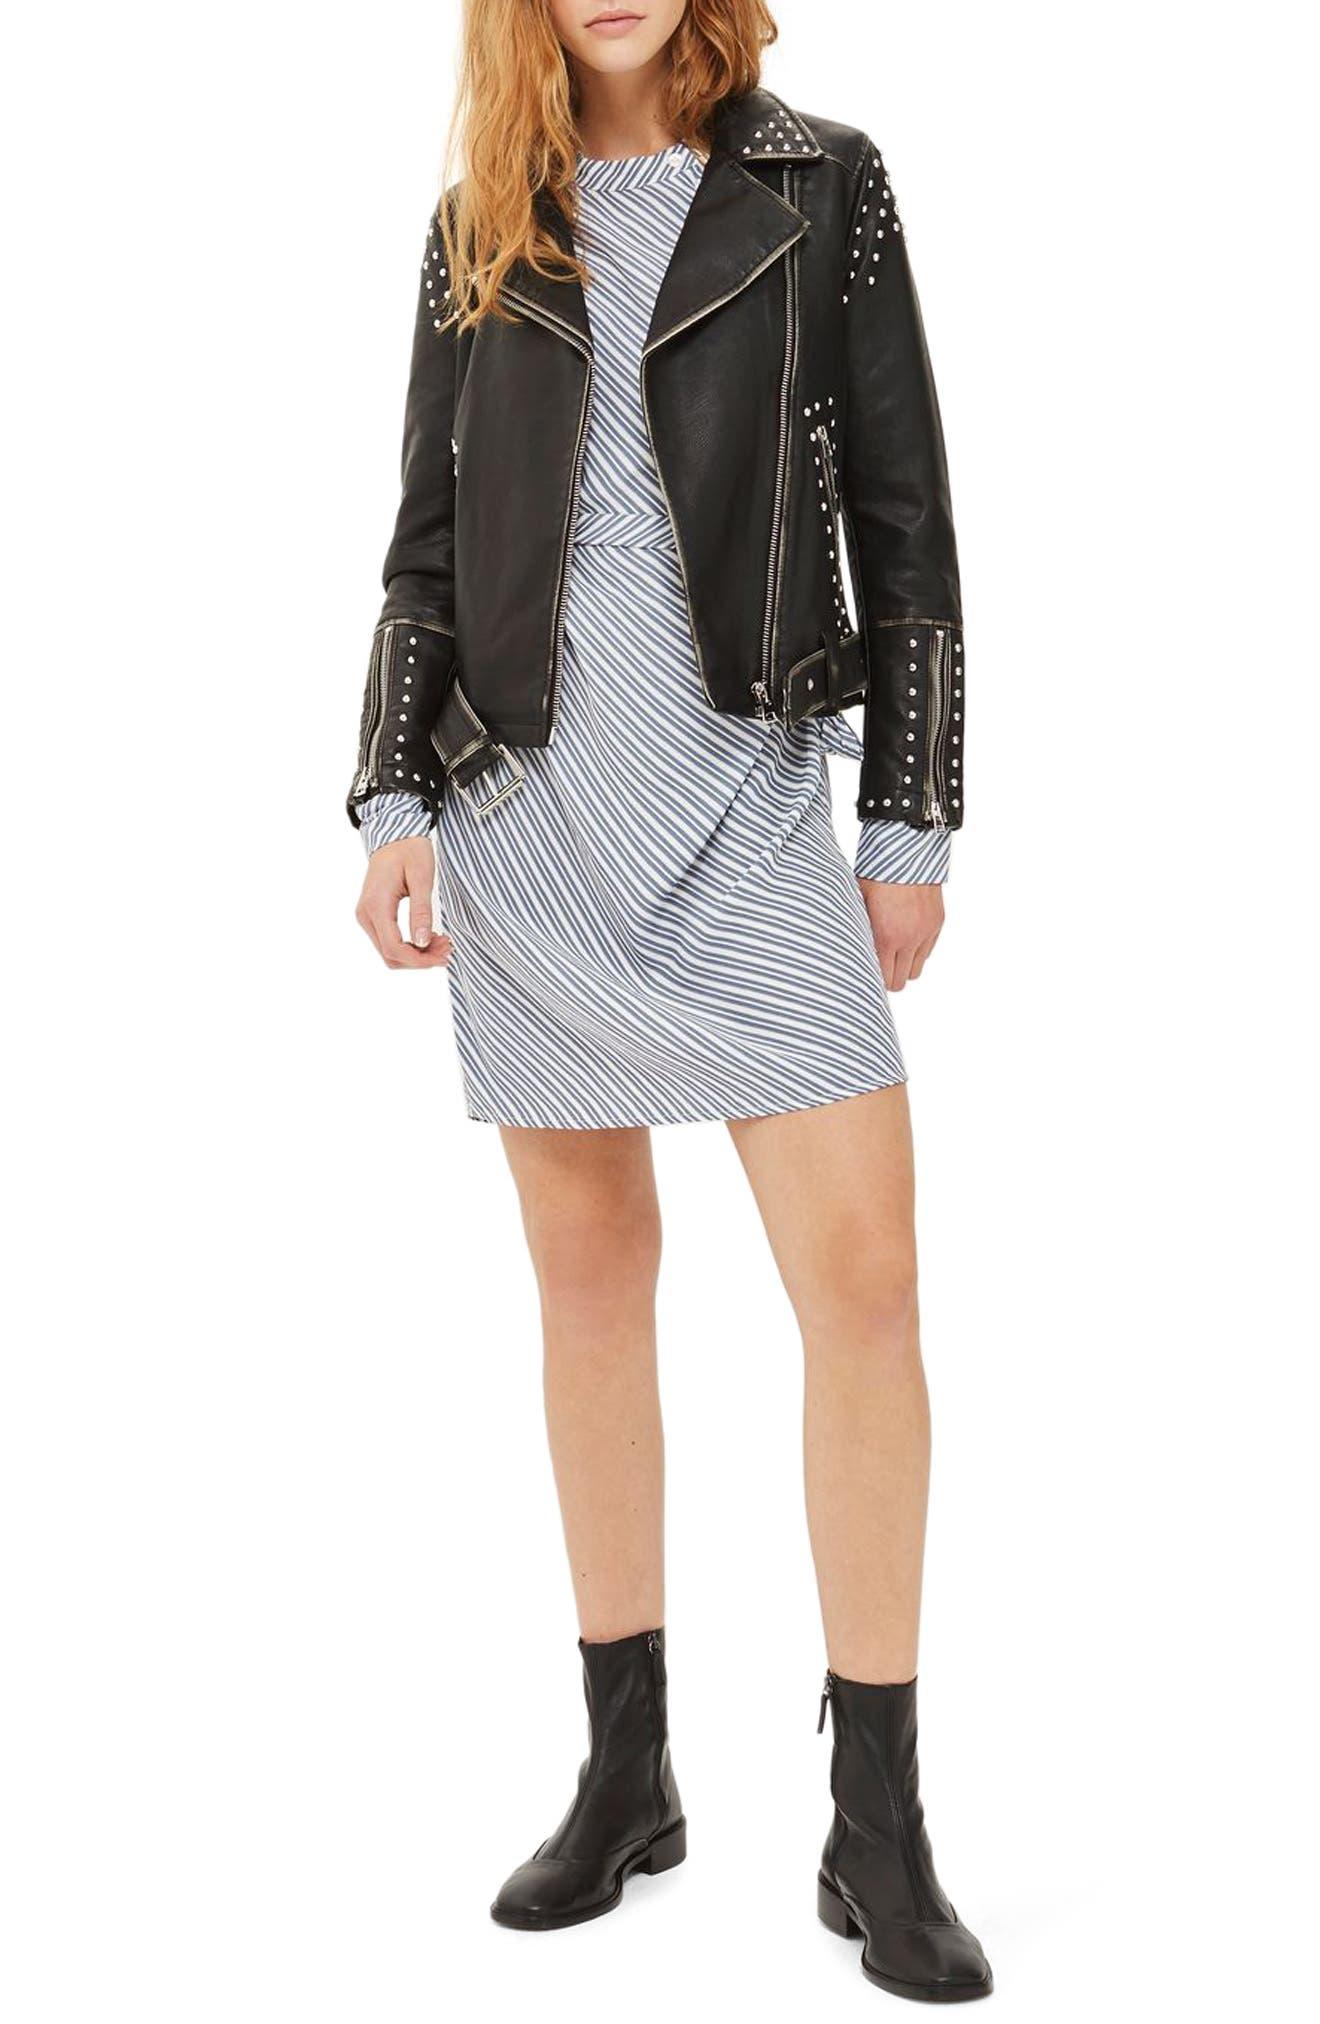 Naomi Studded Faux Leather Biker Jacket,                         Main,                         color, Black